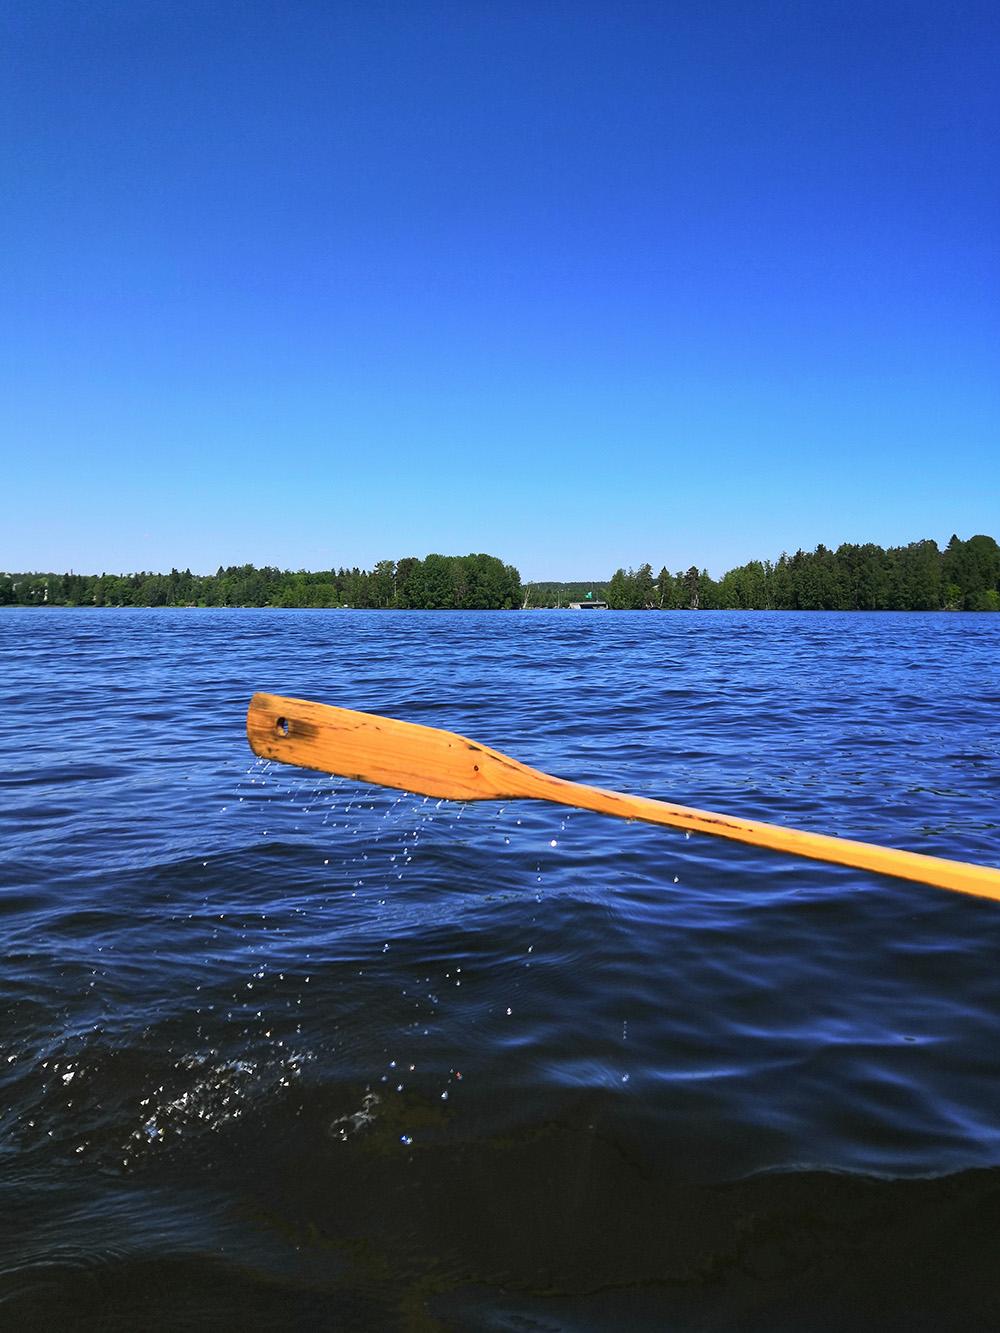 soutuveneen vuokraus Pirkkala